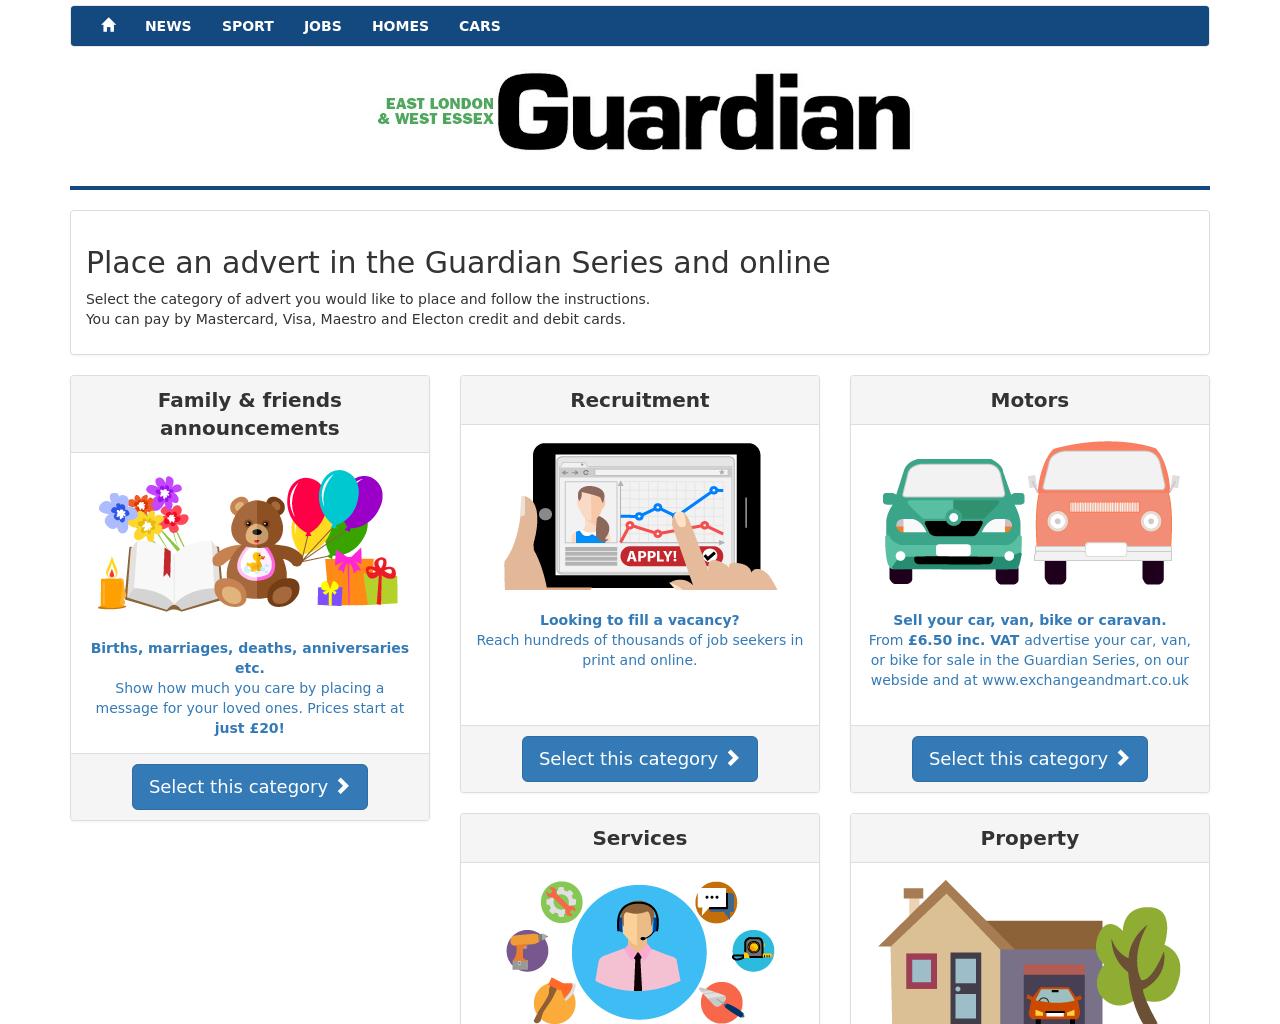 Guardian-Series-Advertising-Reviews-Pricing